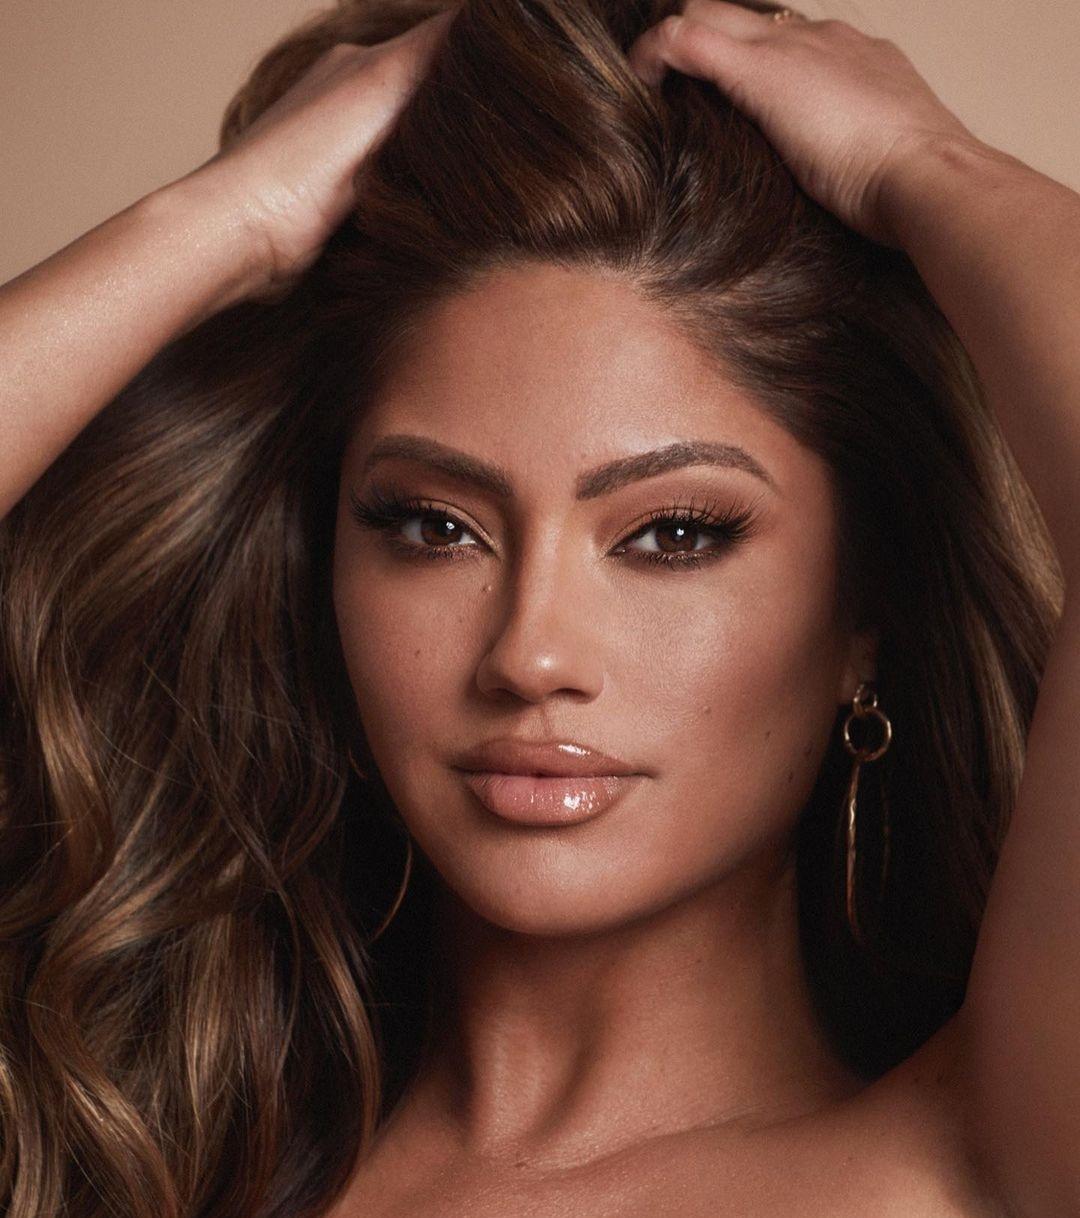 Jessica-Burciaga-Wallpapers-Insta-Fit-Bio-6